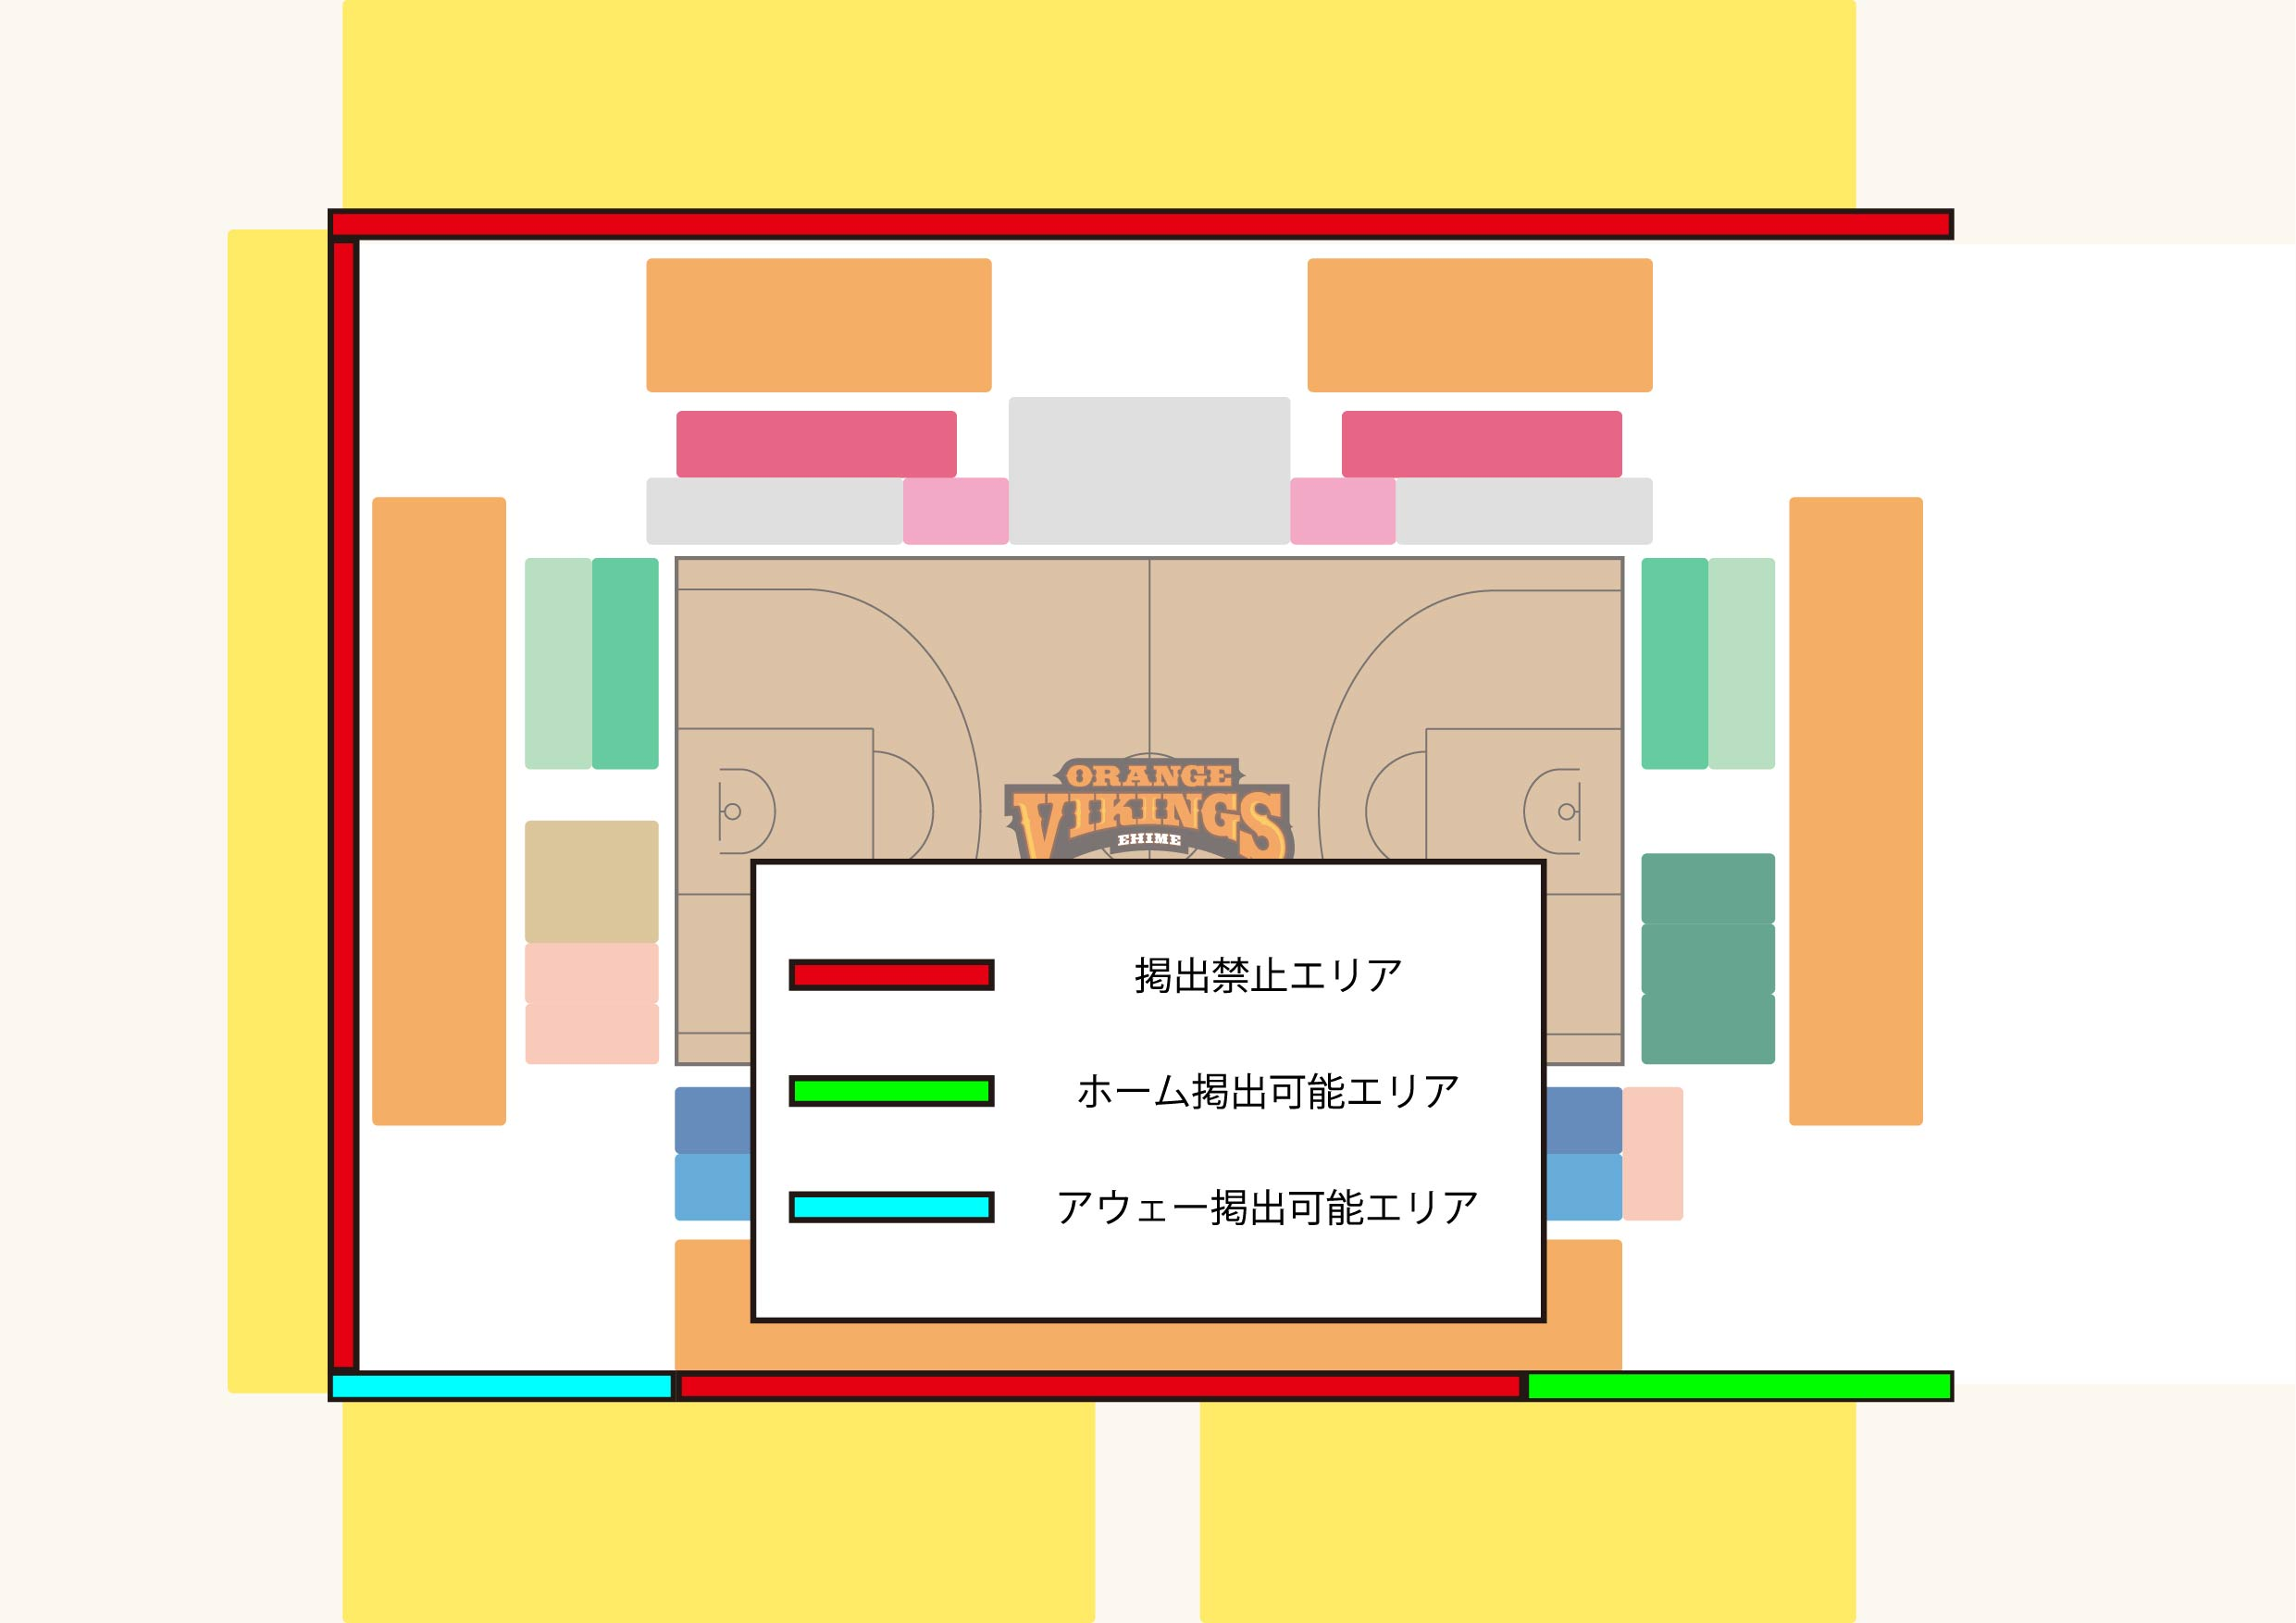 kensou_flag.jpg